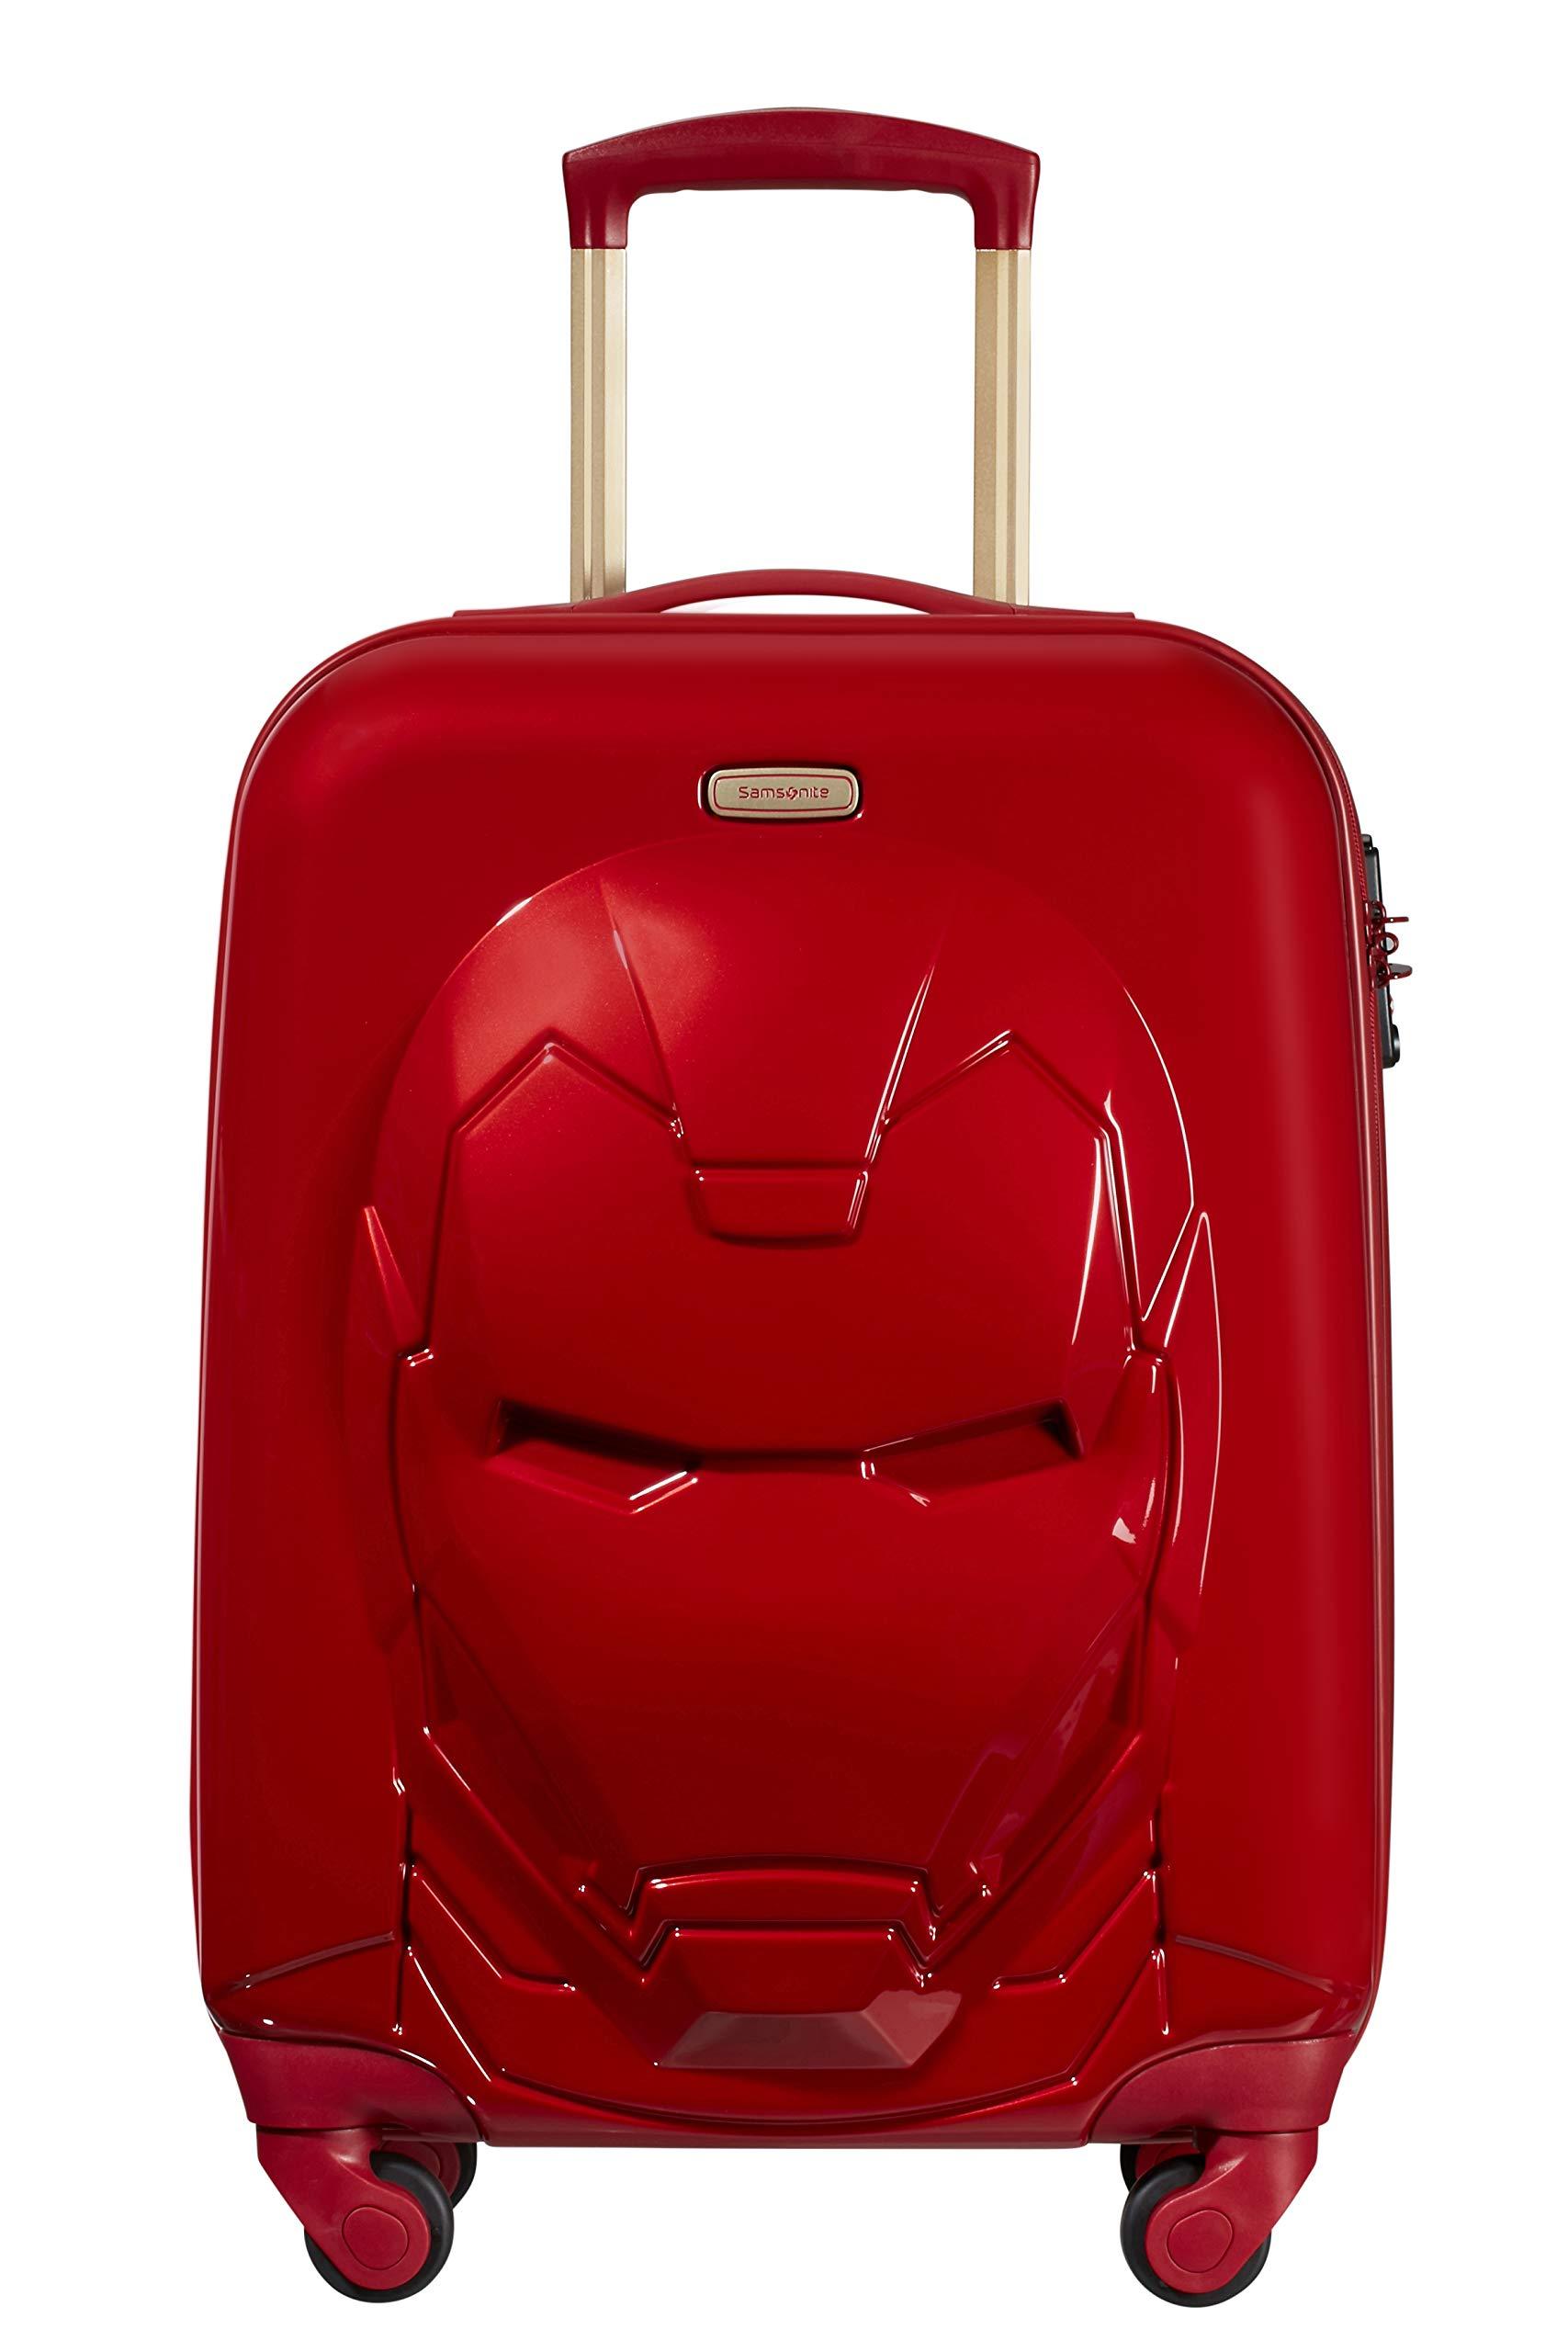 Samsonite Disney Ultimate 2.0 – Equipaje de Mano, 55 cm, 35.5 l, Rojo (Iron Man Red)